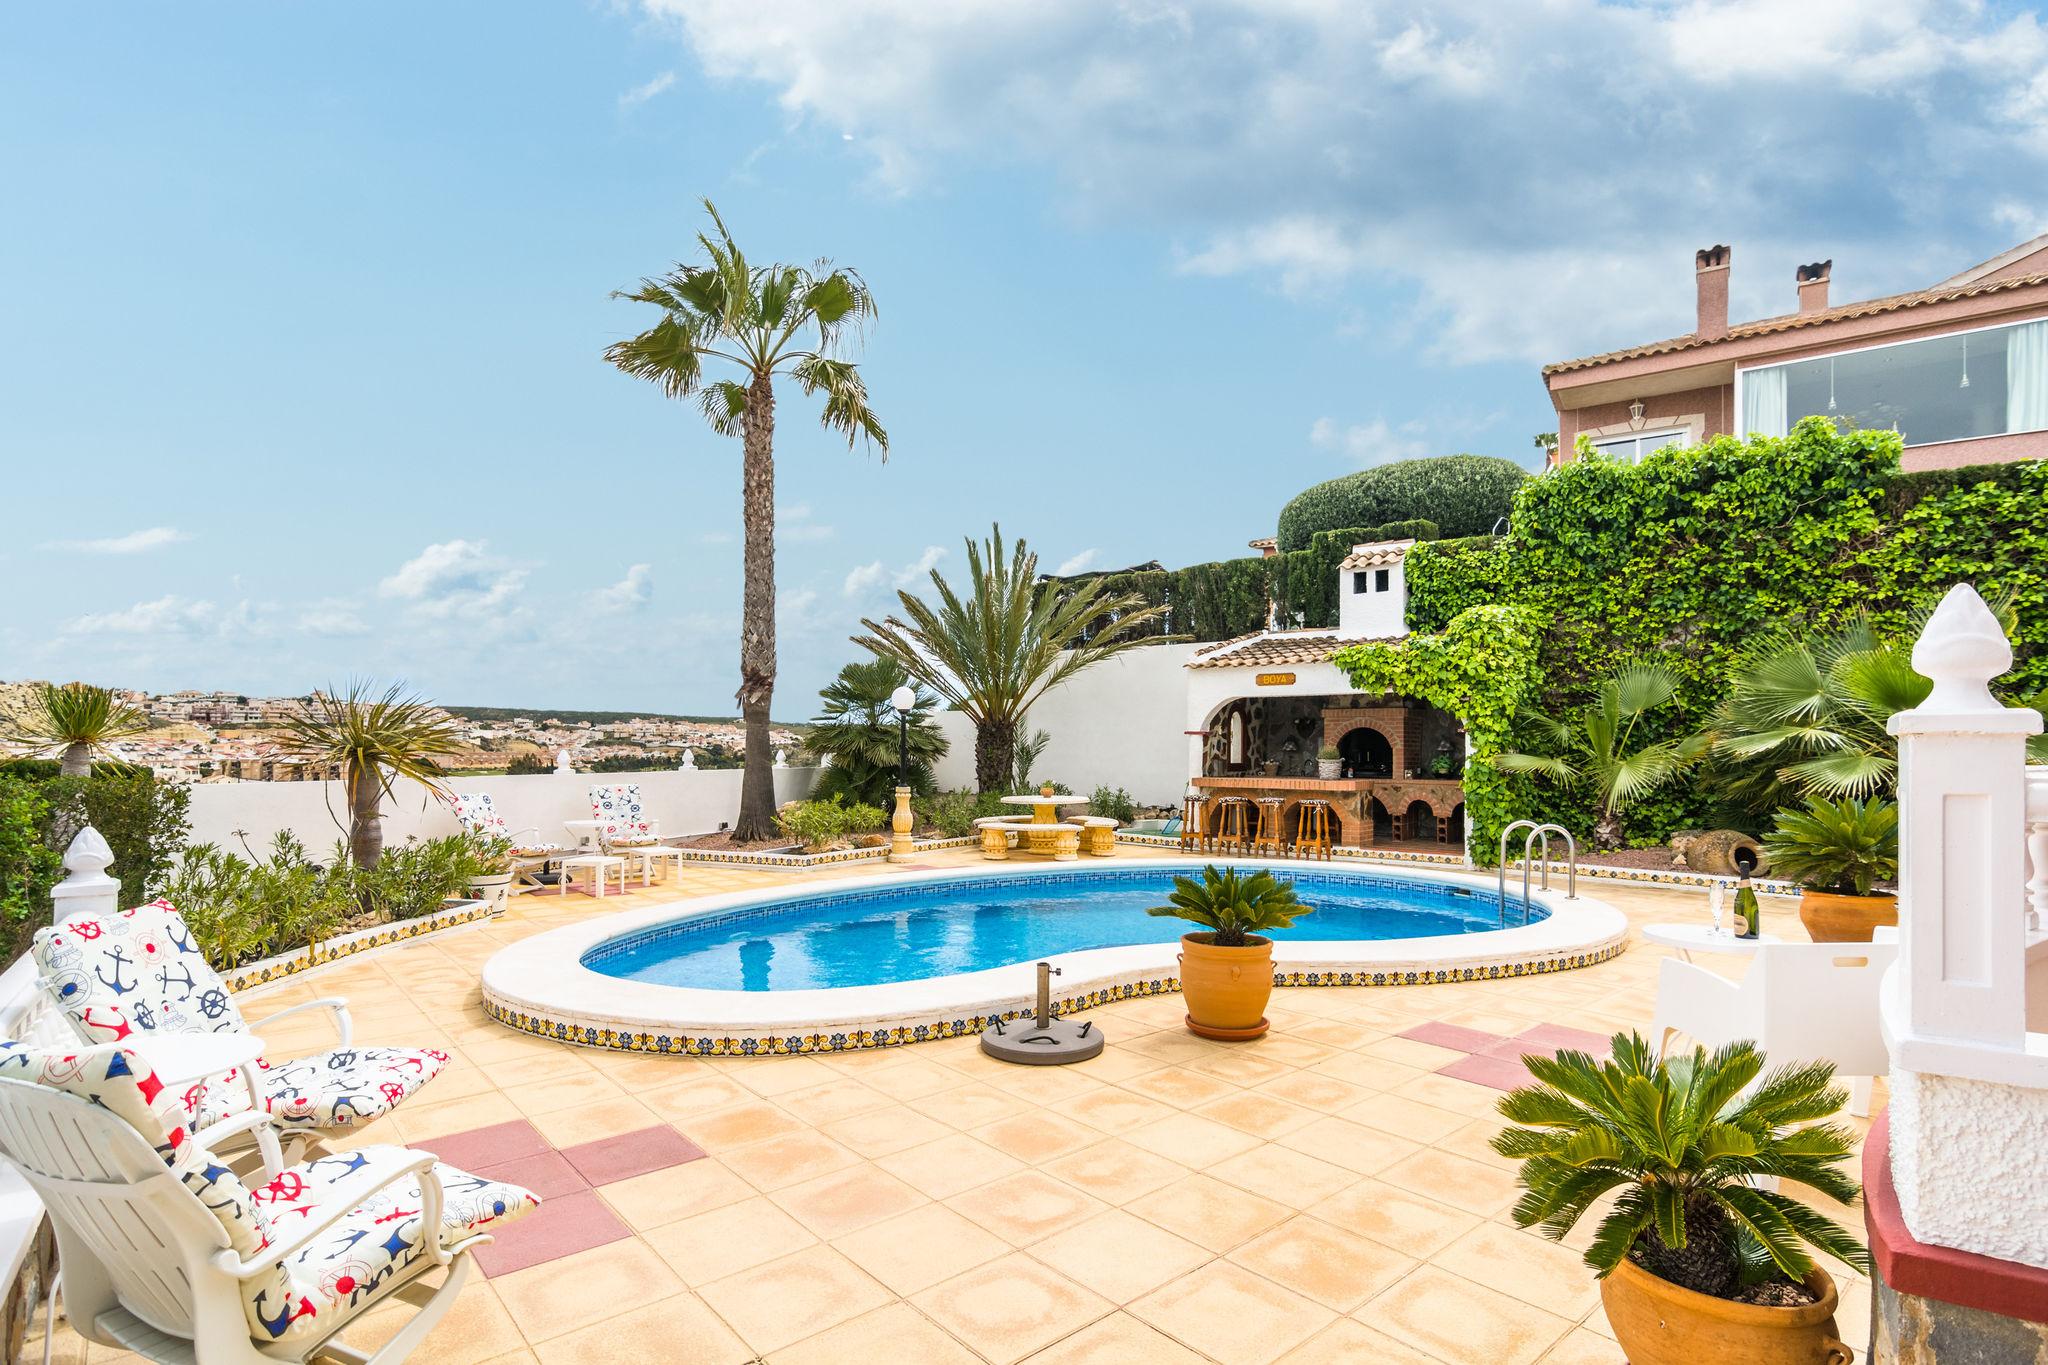 Moderne Villa mit Swimmingpool in Rojales